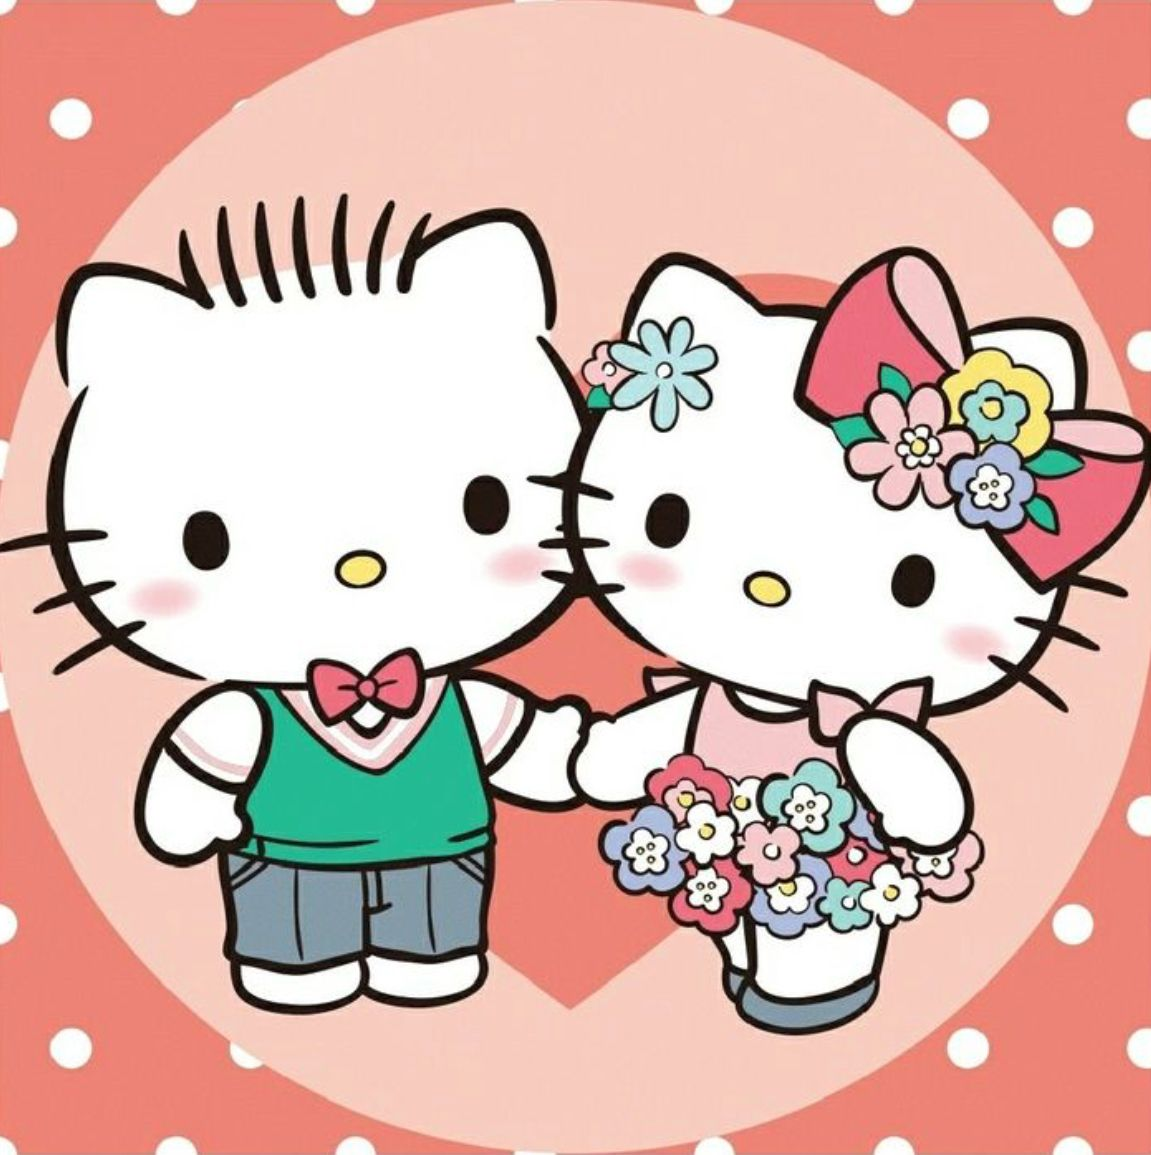 高手过招neal下载_hellokittydaniel_hello kitty daniel__ - www.yyxx5.com